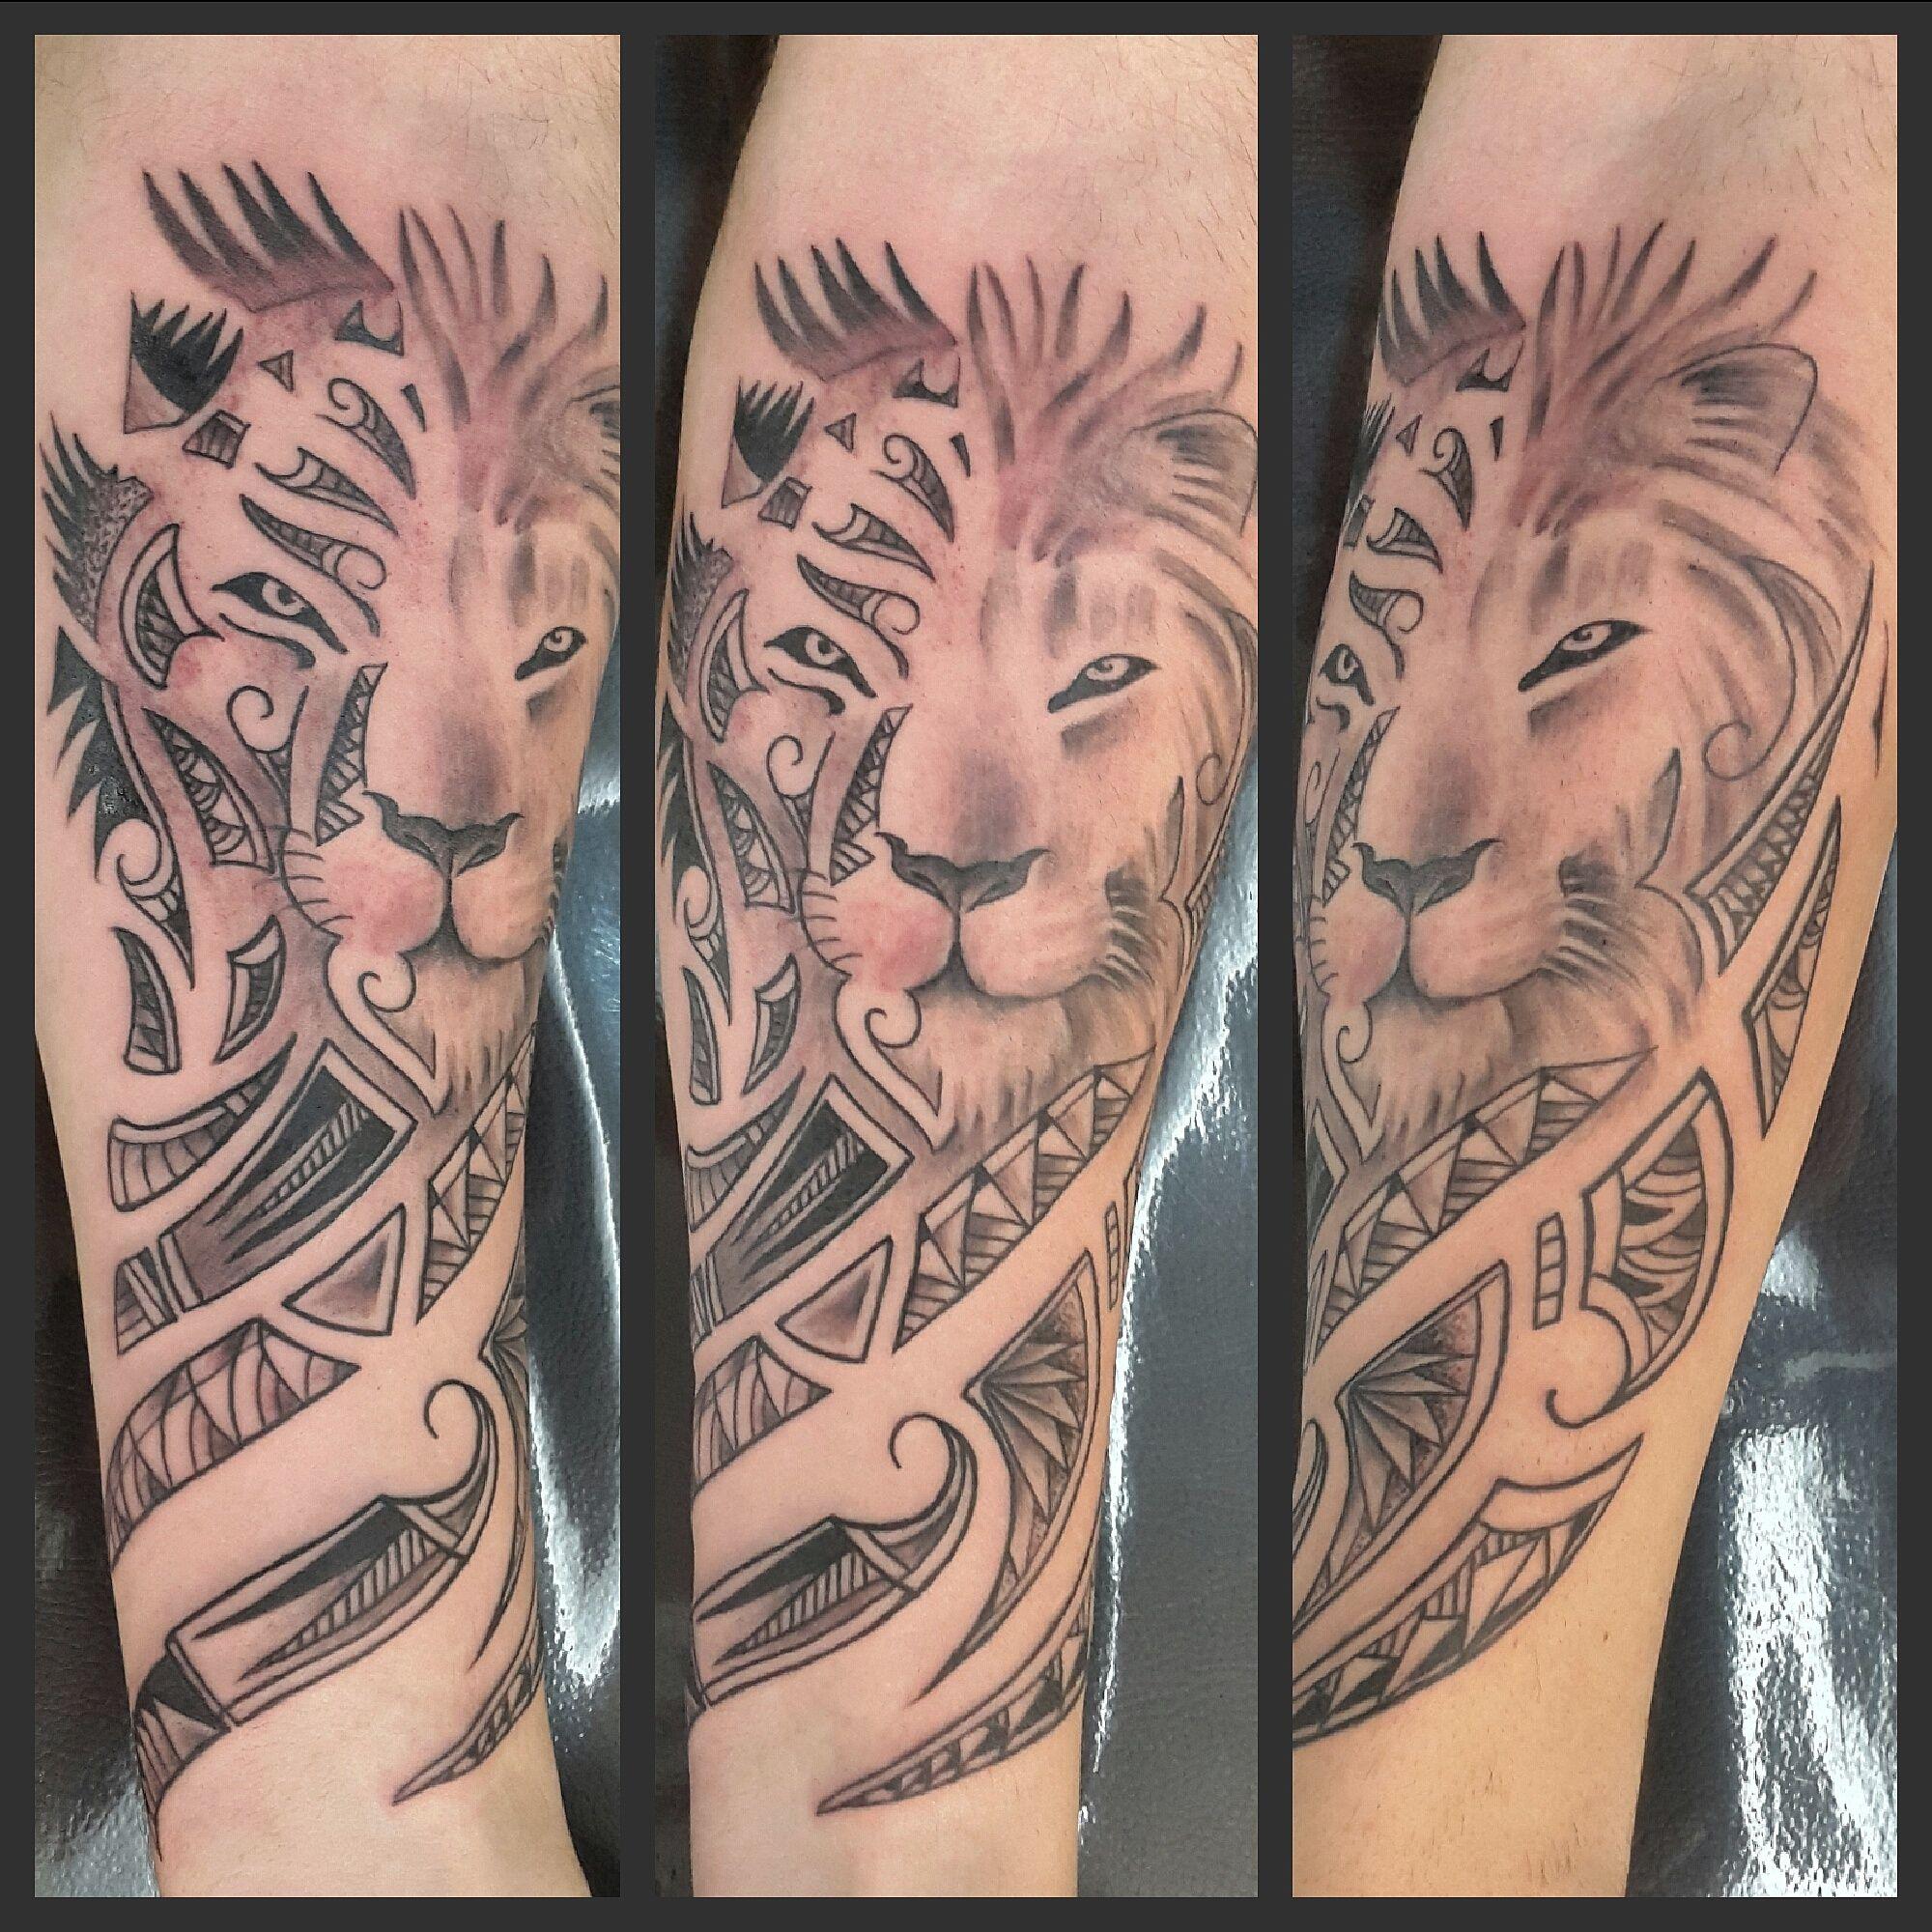 Black Work Maori Lion Tattoo By Lele Marques (RadacTattoo